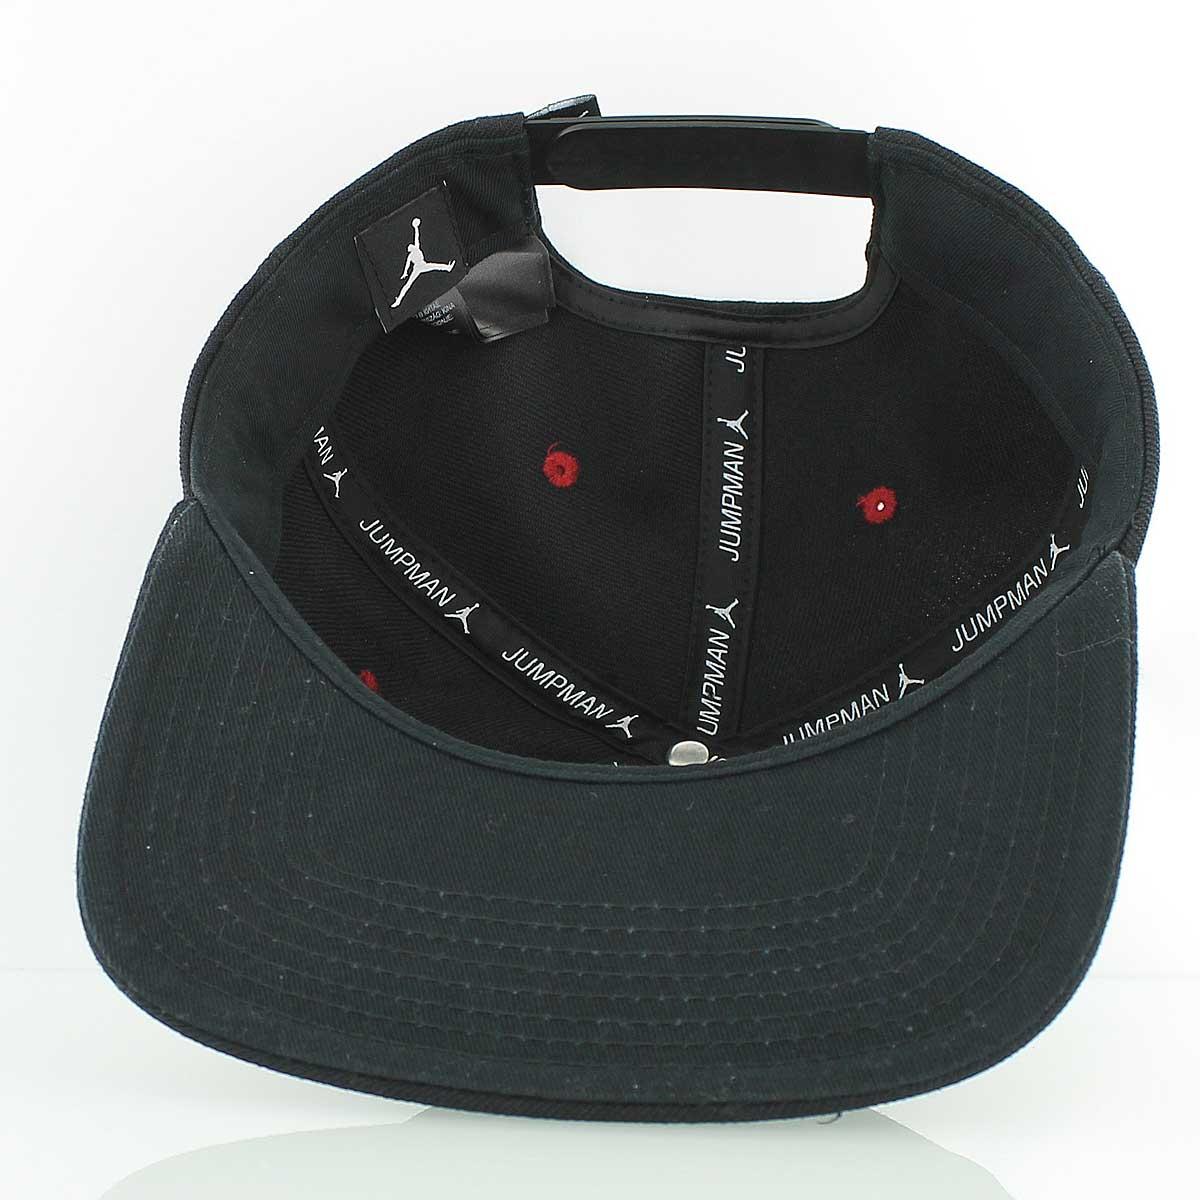 8e420f78d653 Jordan Jumpman Snapback - Кепка(Снепбек). Артикул  619360-016